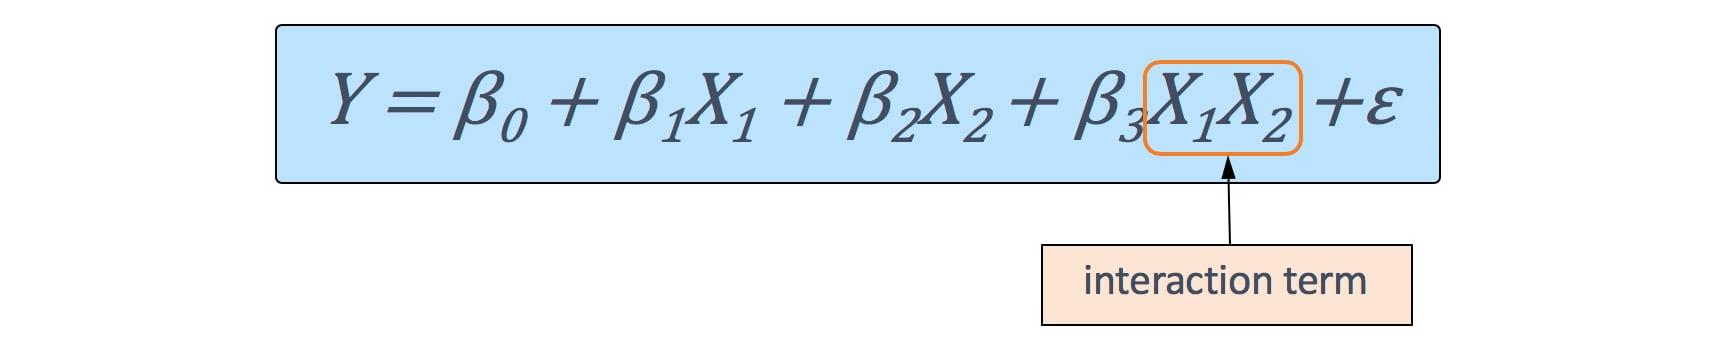 mlr-interactions-model